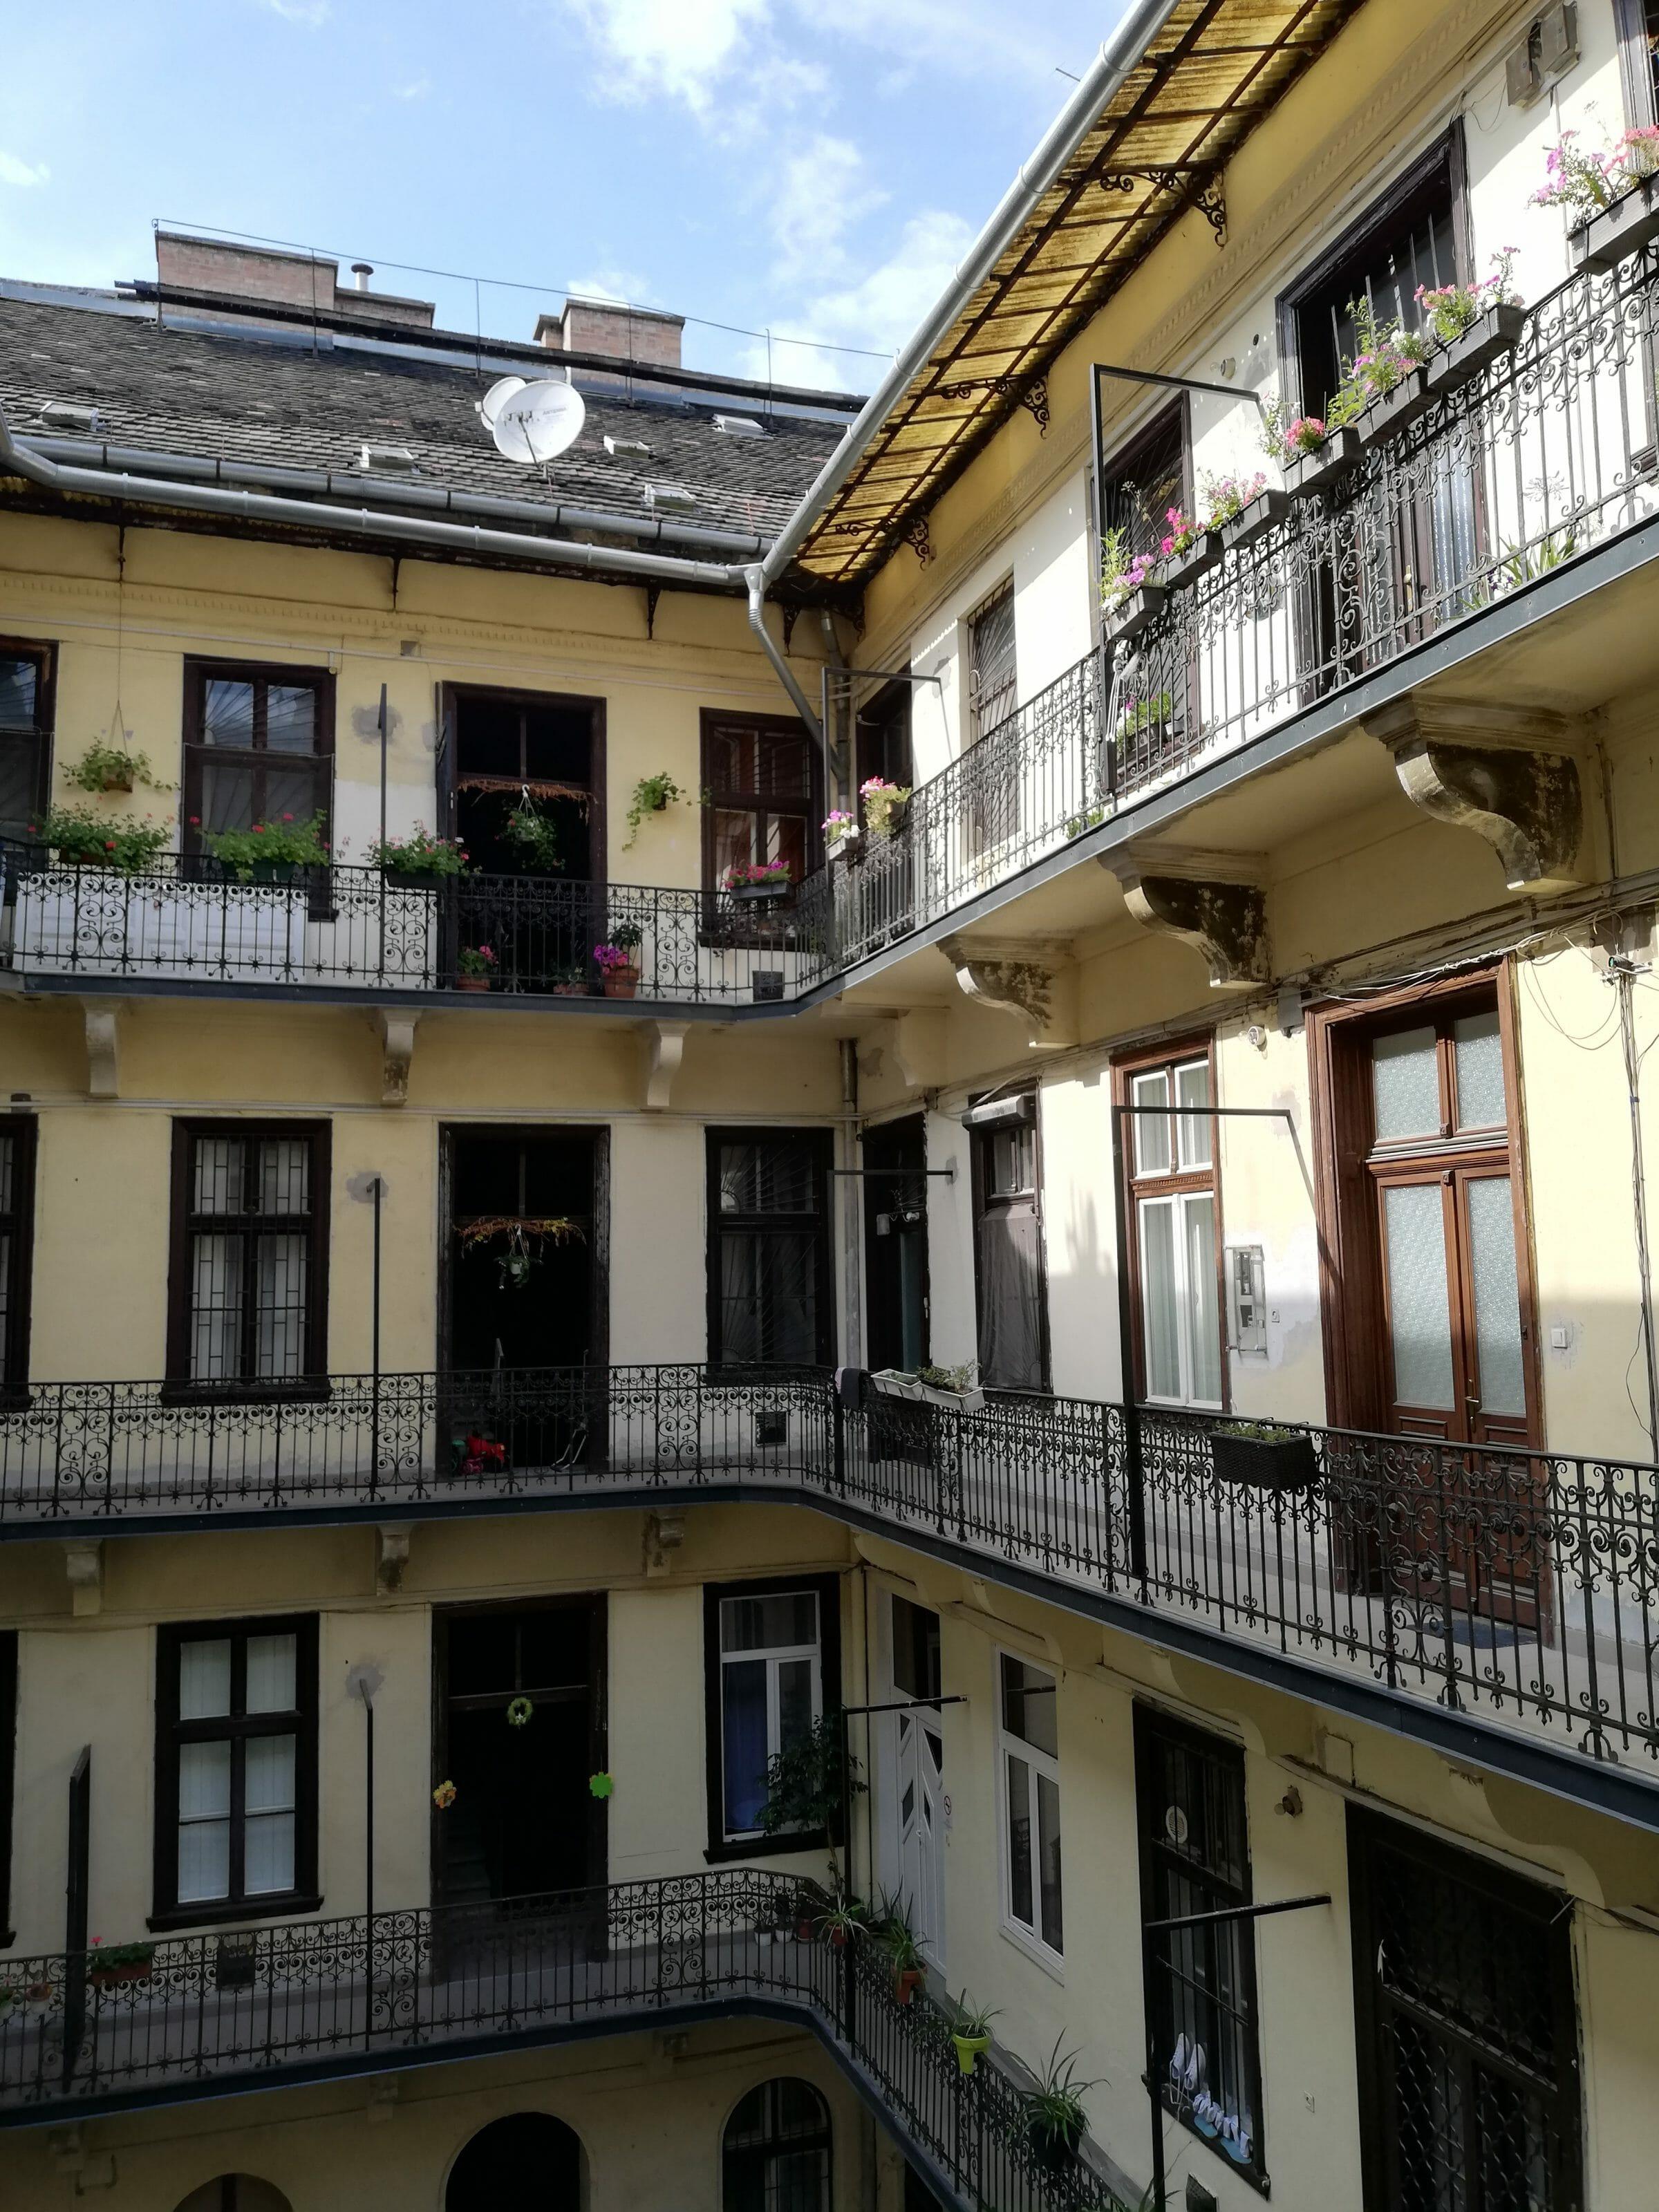 sunny rooms, interior courtyard